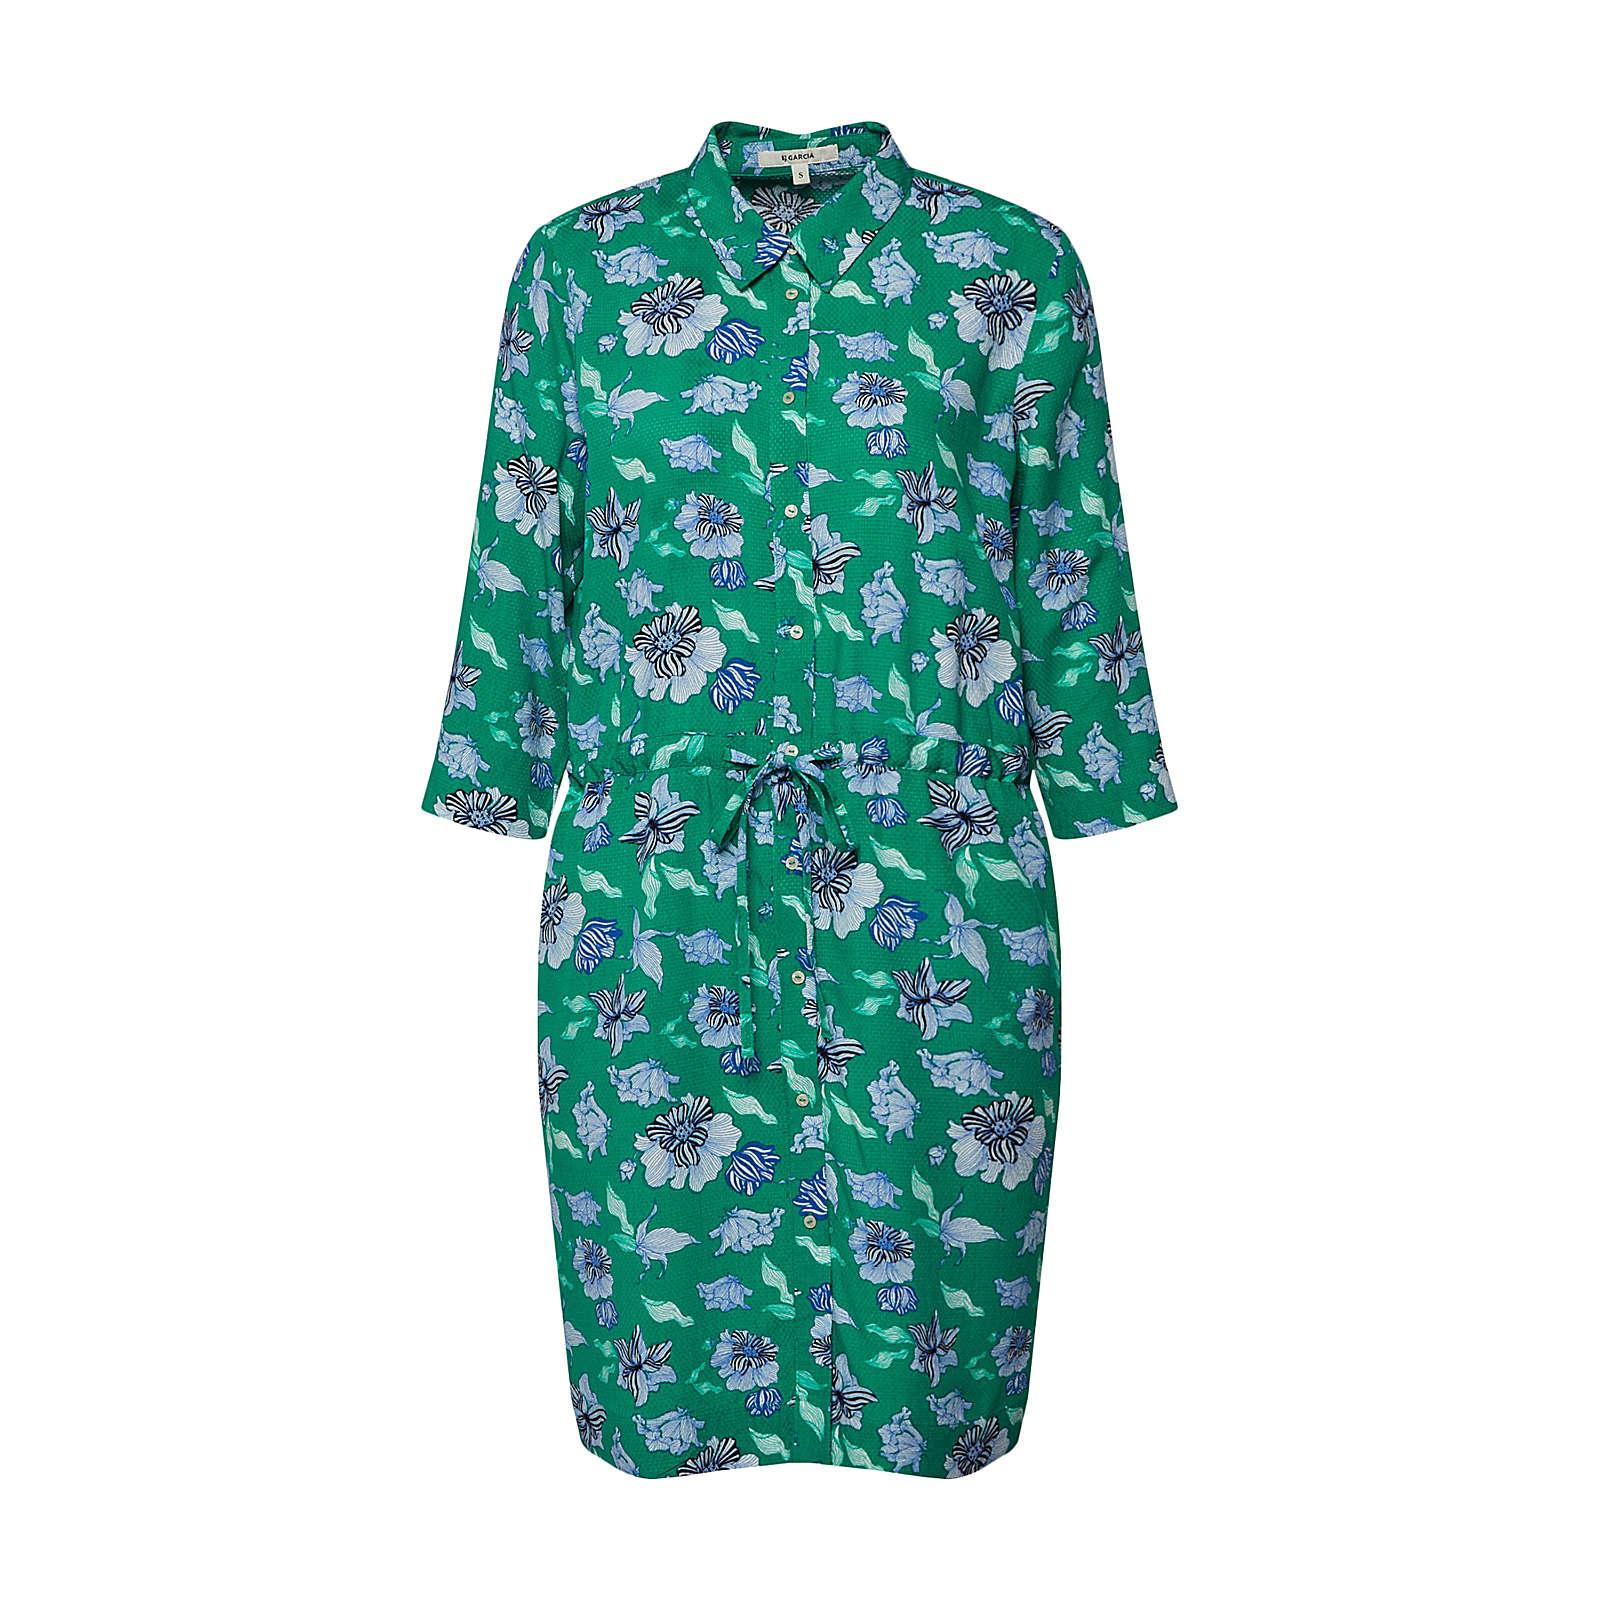 GARCIA Blusenkleid Blusenkleider grün Damen Gr. 38